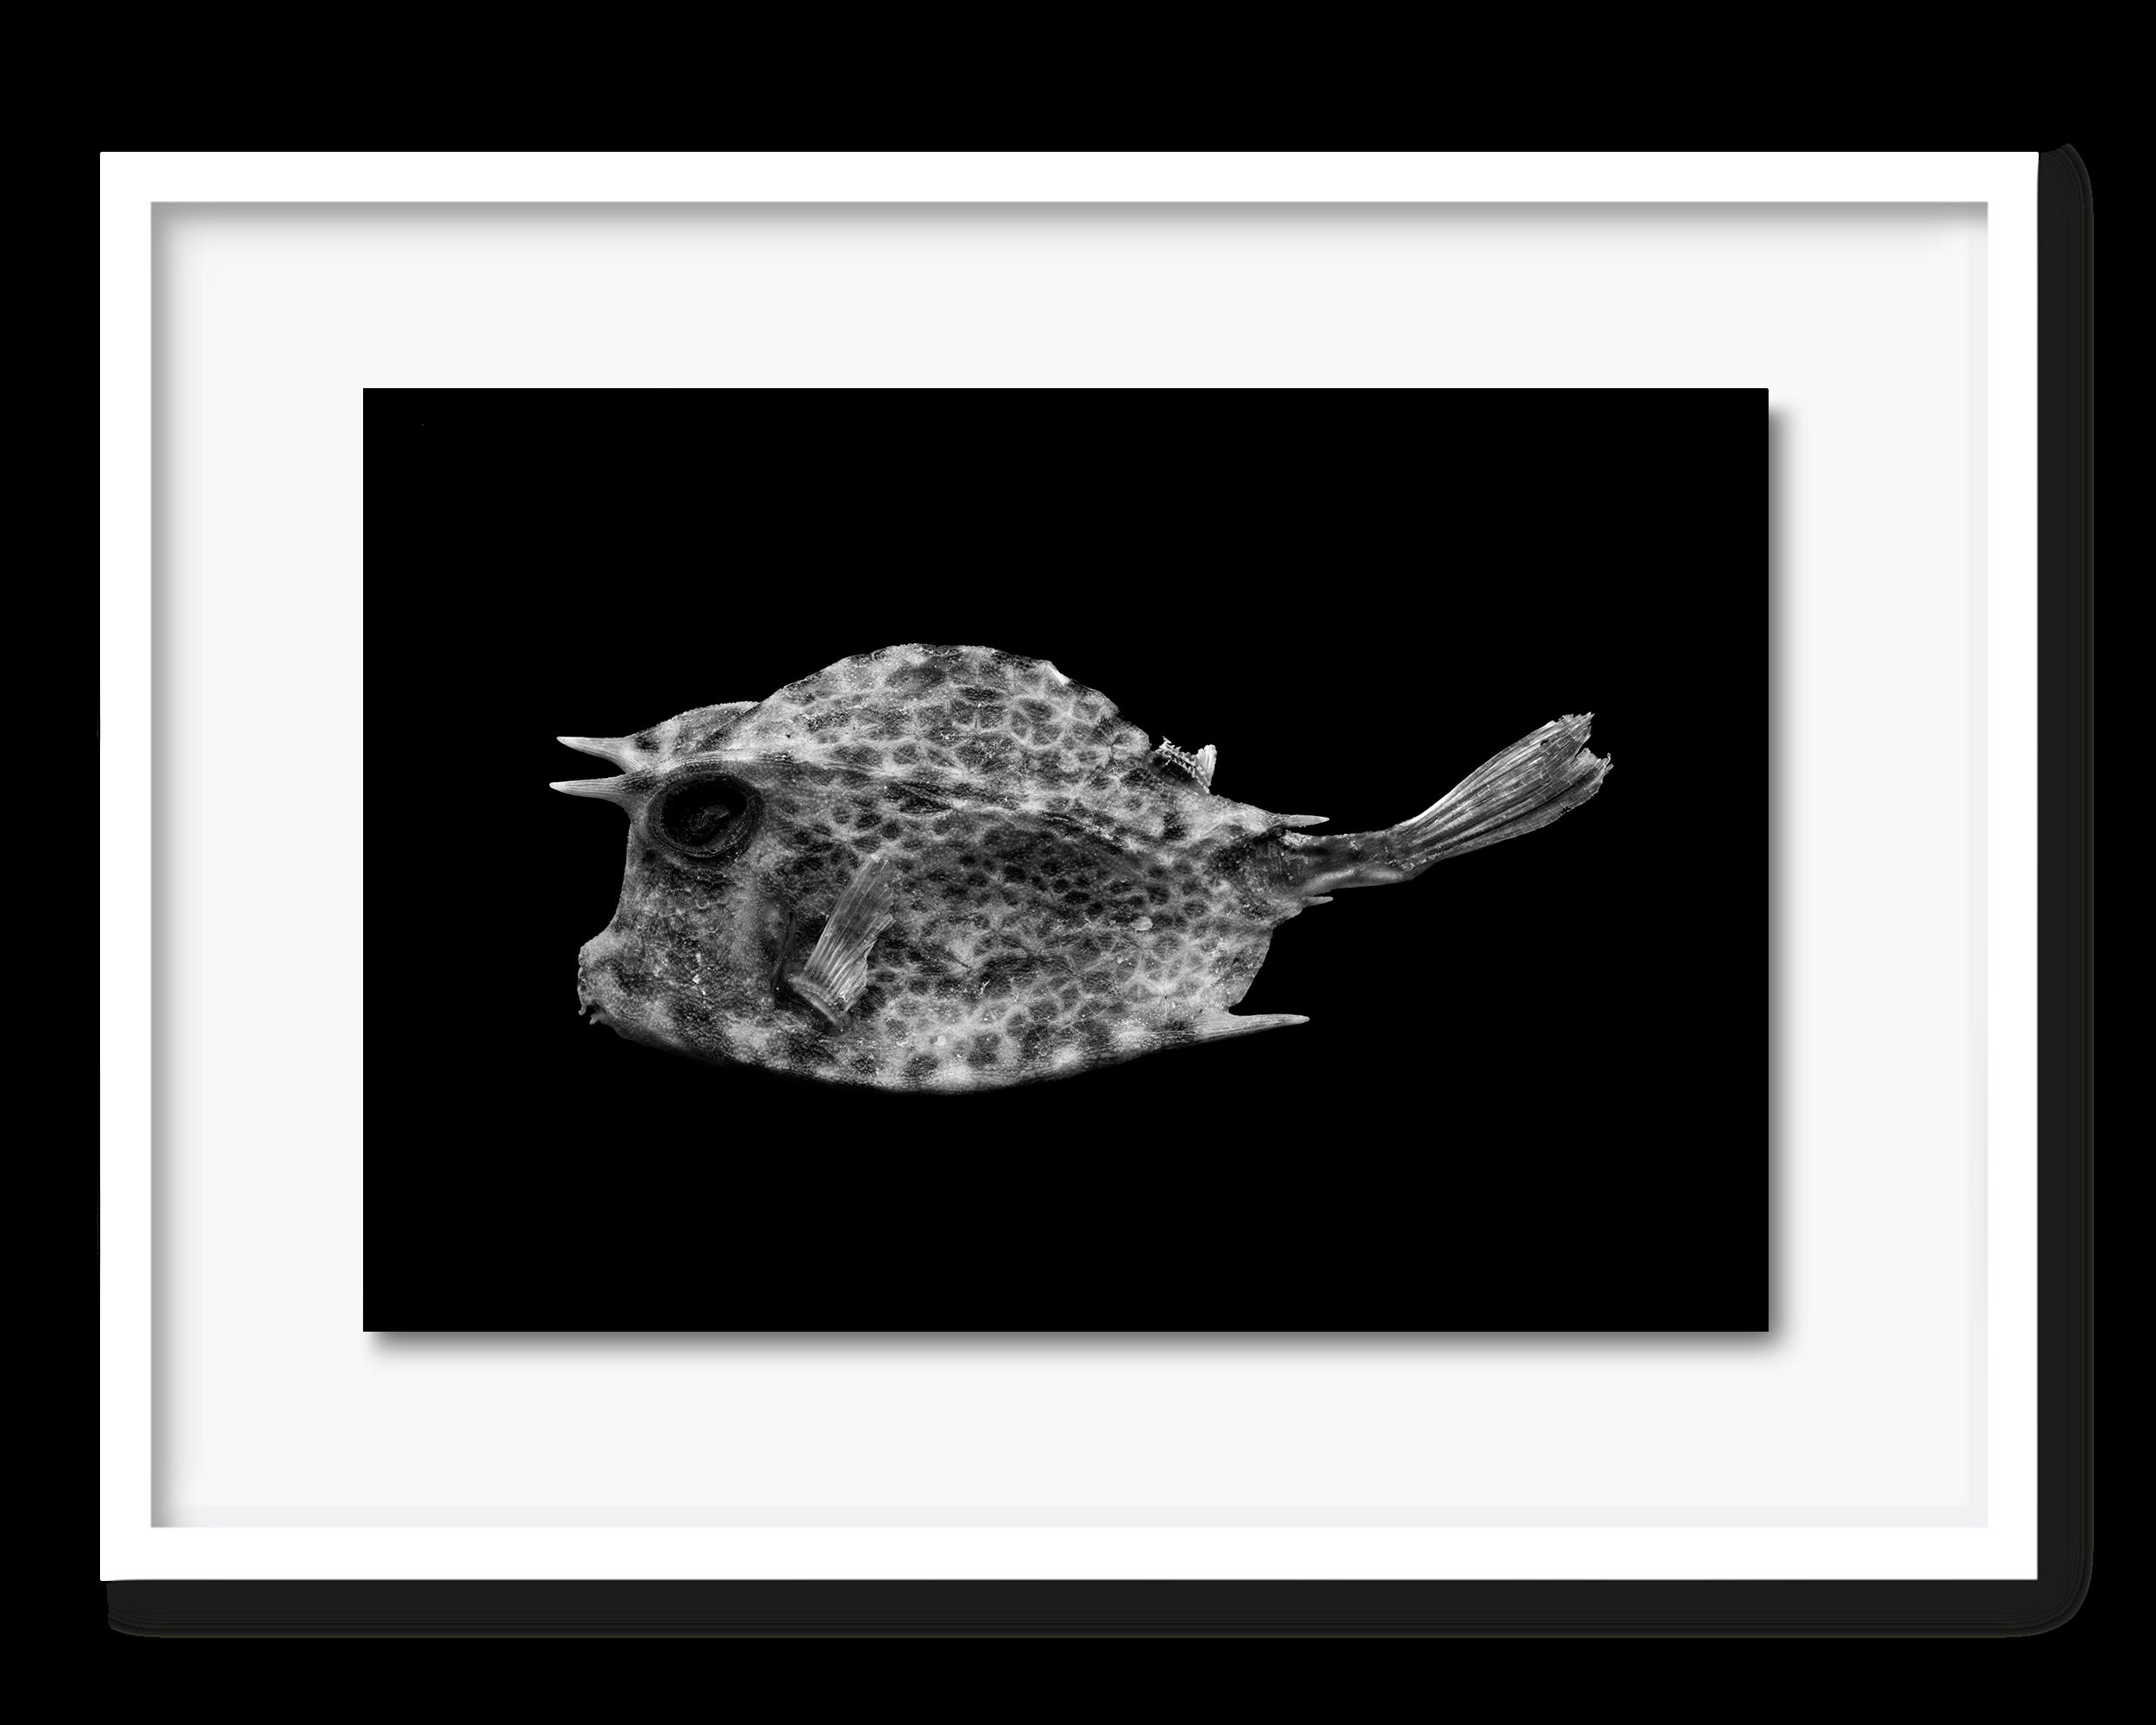 56.david-pearce-shellfish.png